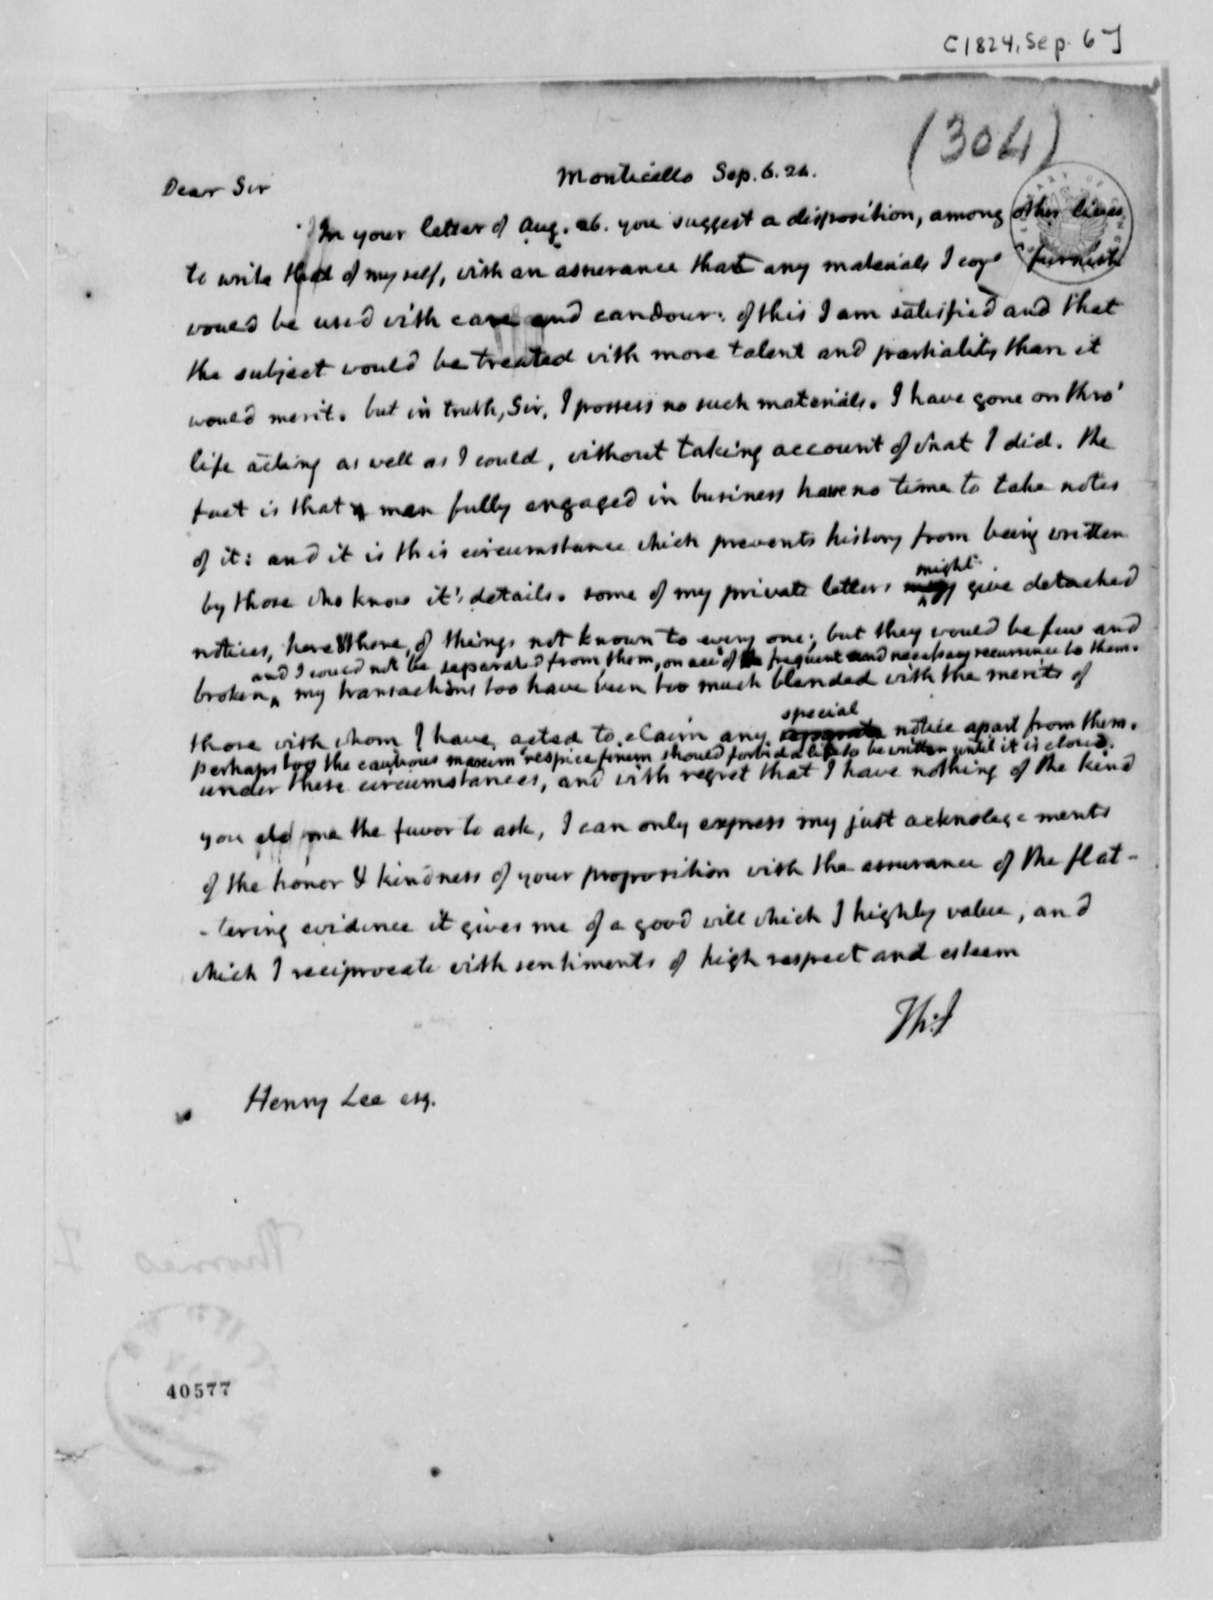 Thomas Jefferson to Henry Lee, Jr., September 6, 1824